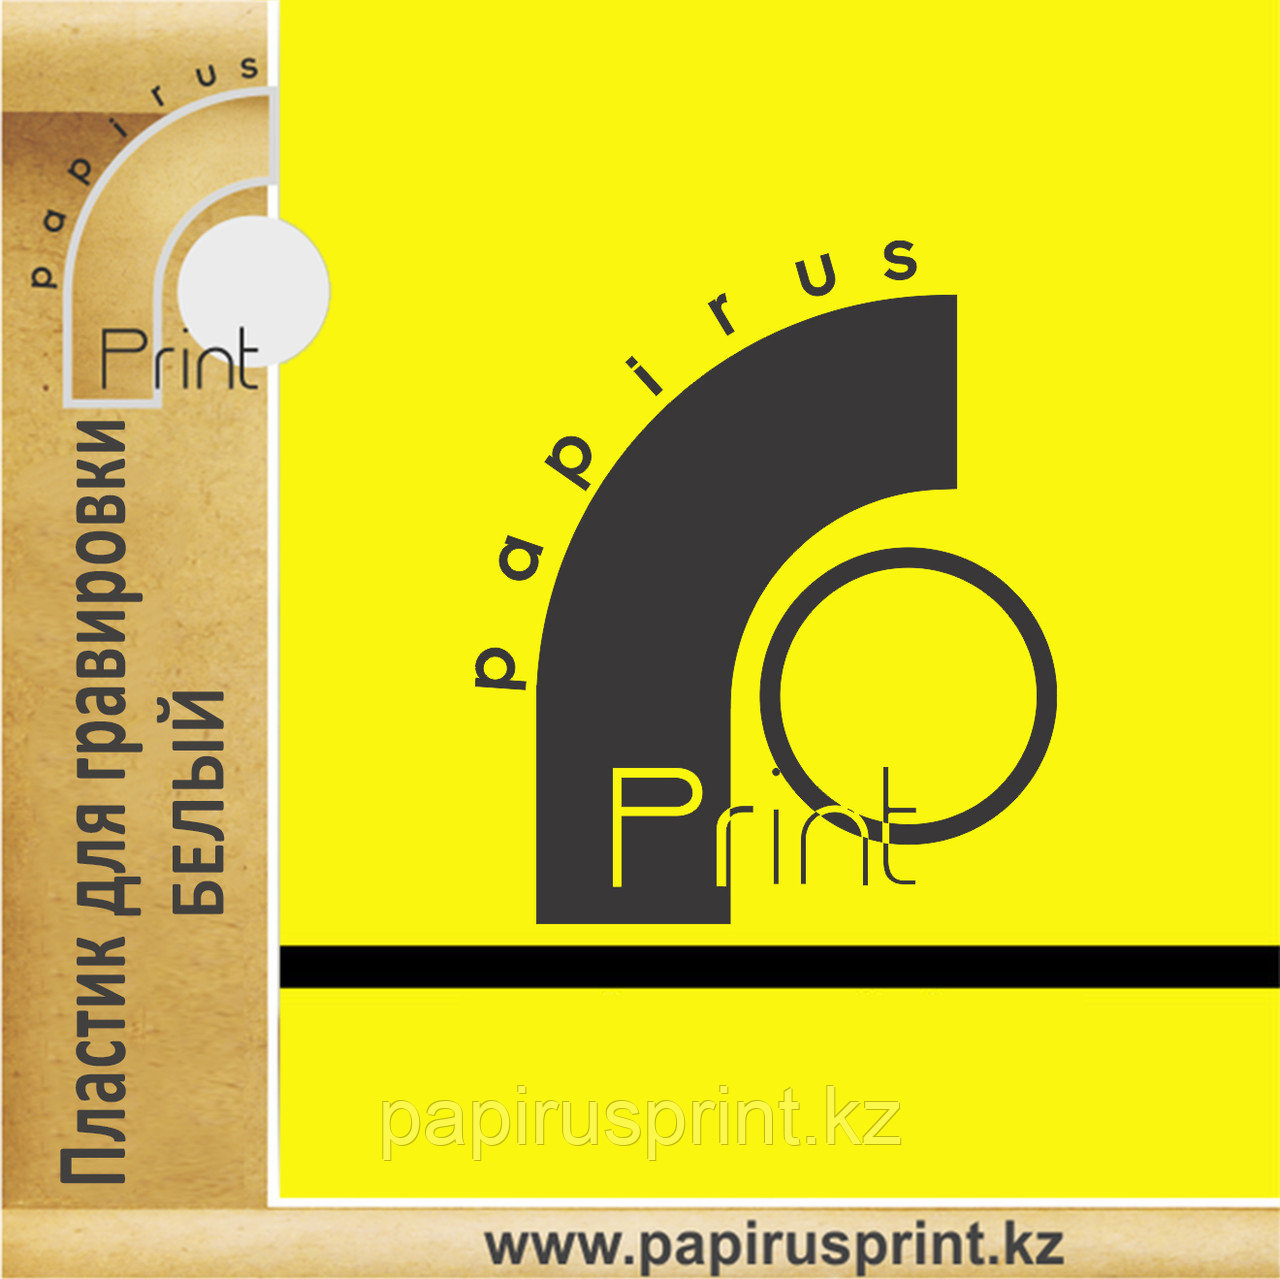 Пластик для гравировки (Желтый) 1,2м х 0,6м